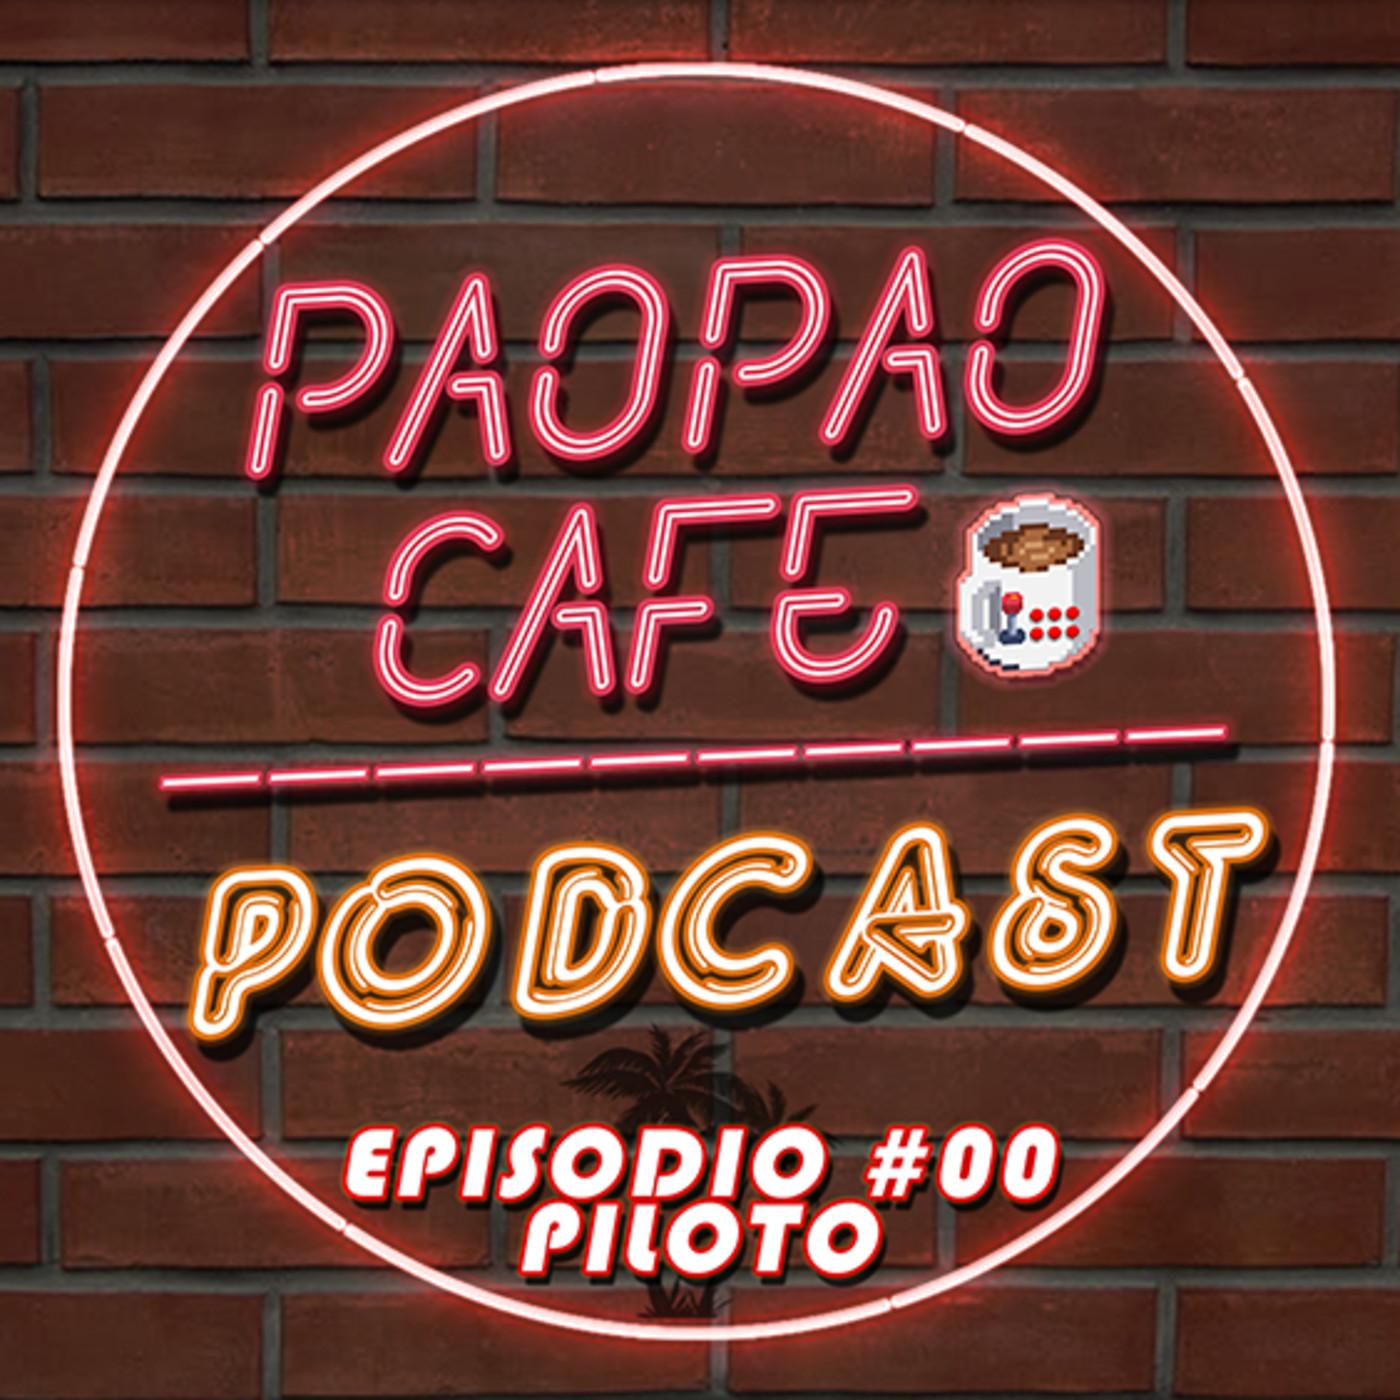 Pao Pao Café Podcast -00- KOF '94 feat. KOF XIV (PILOTO)